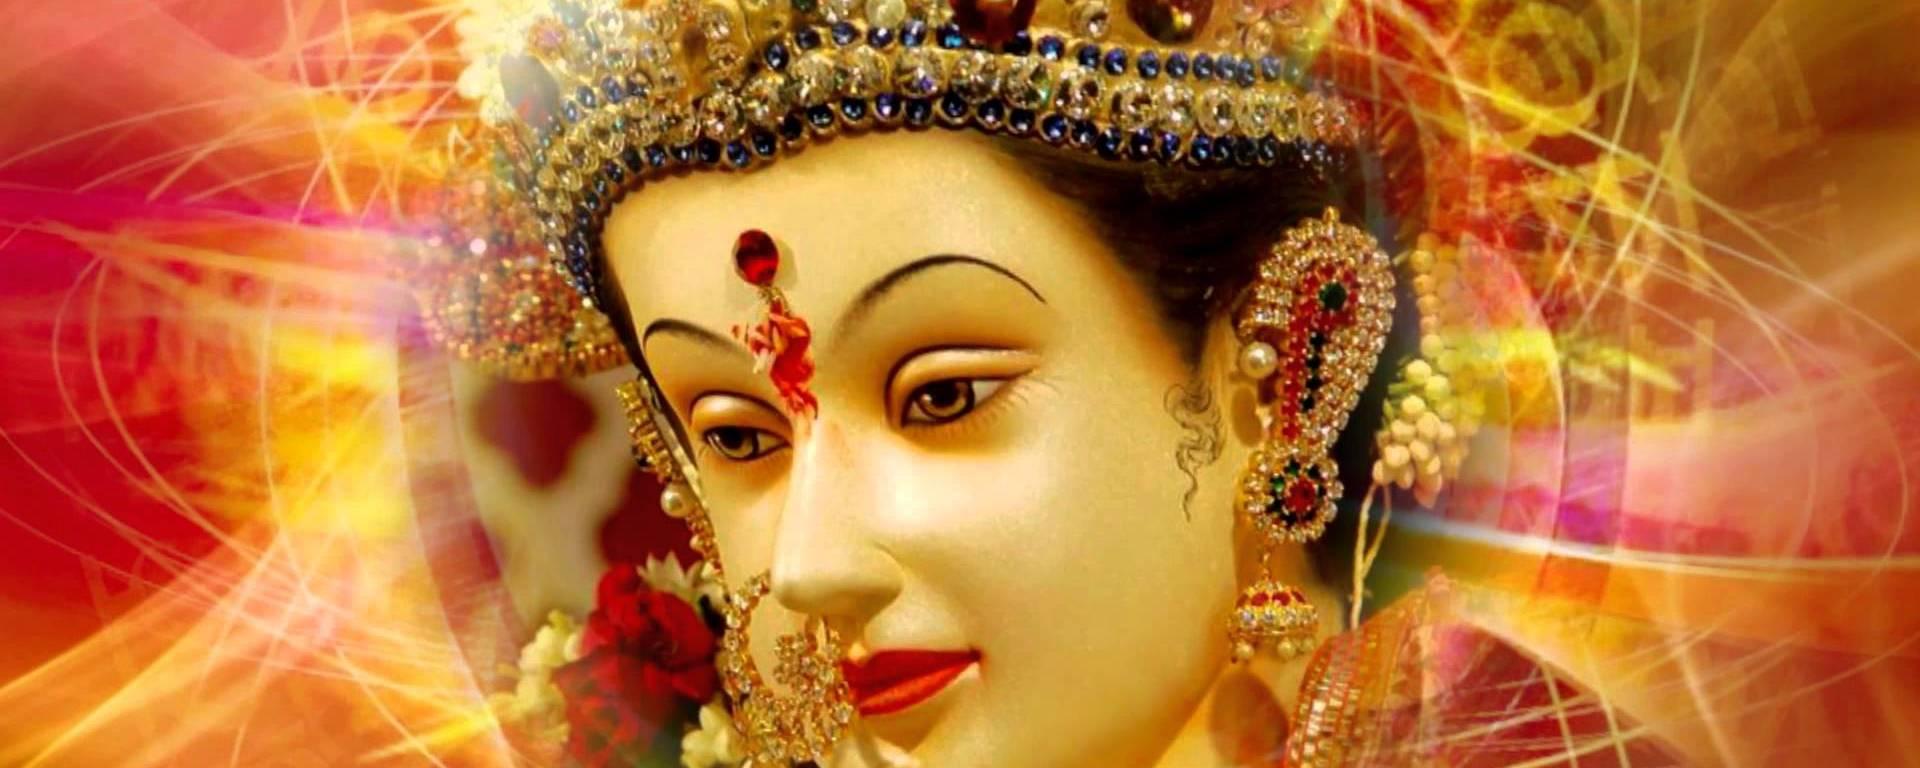 Devi Navratri  God Both Male And Female  Bhavanajagat-1445